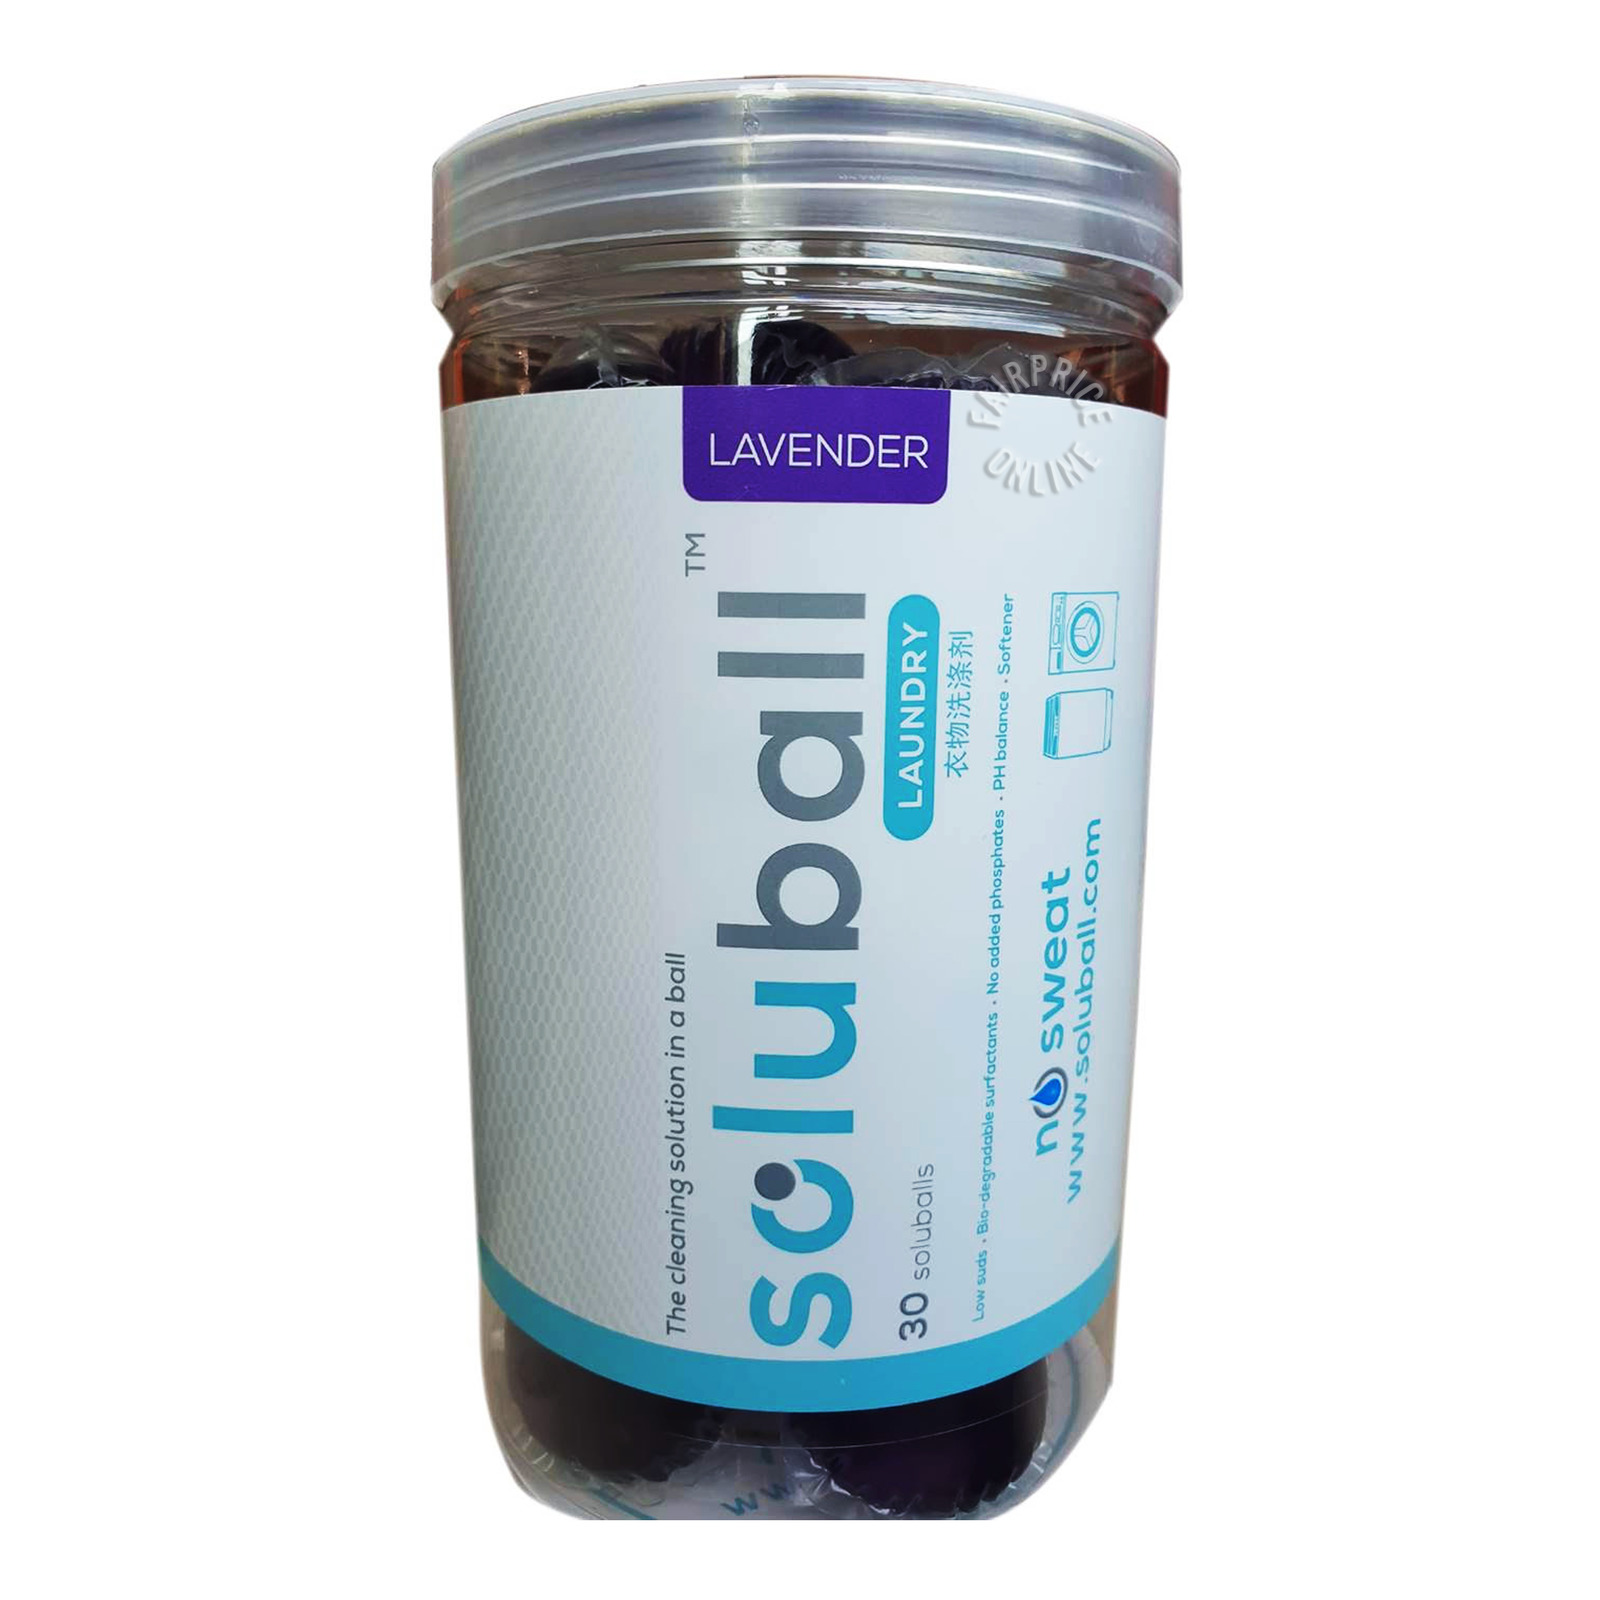 Soluball Laundry Capsules - Lavender